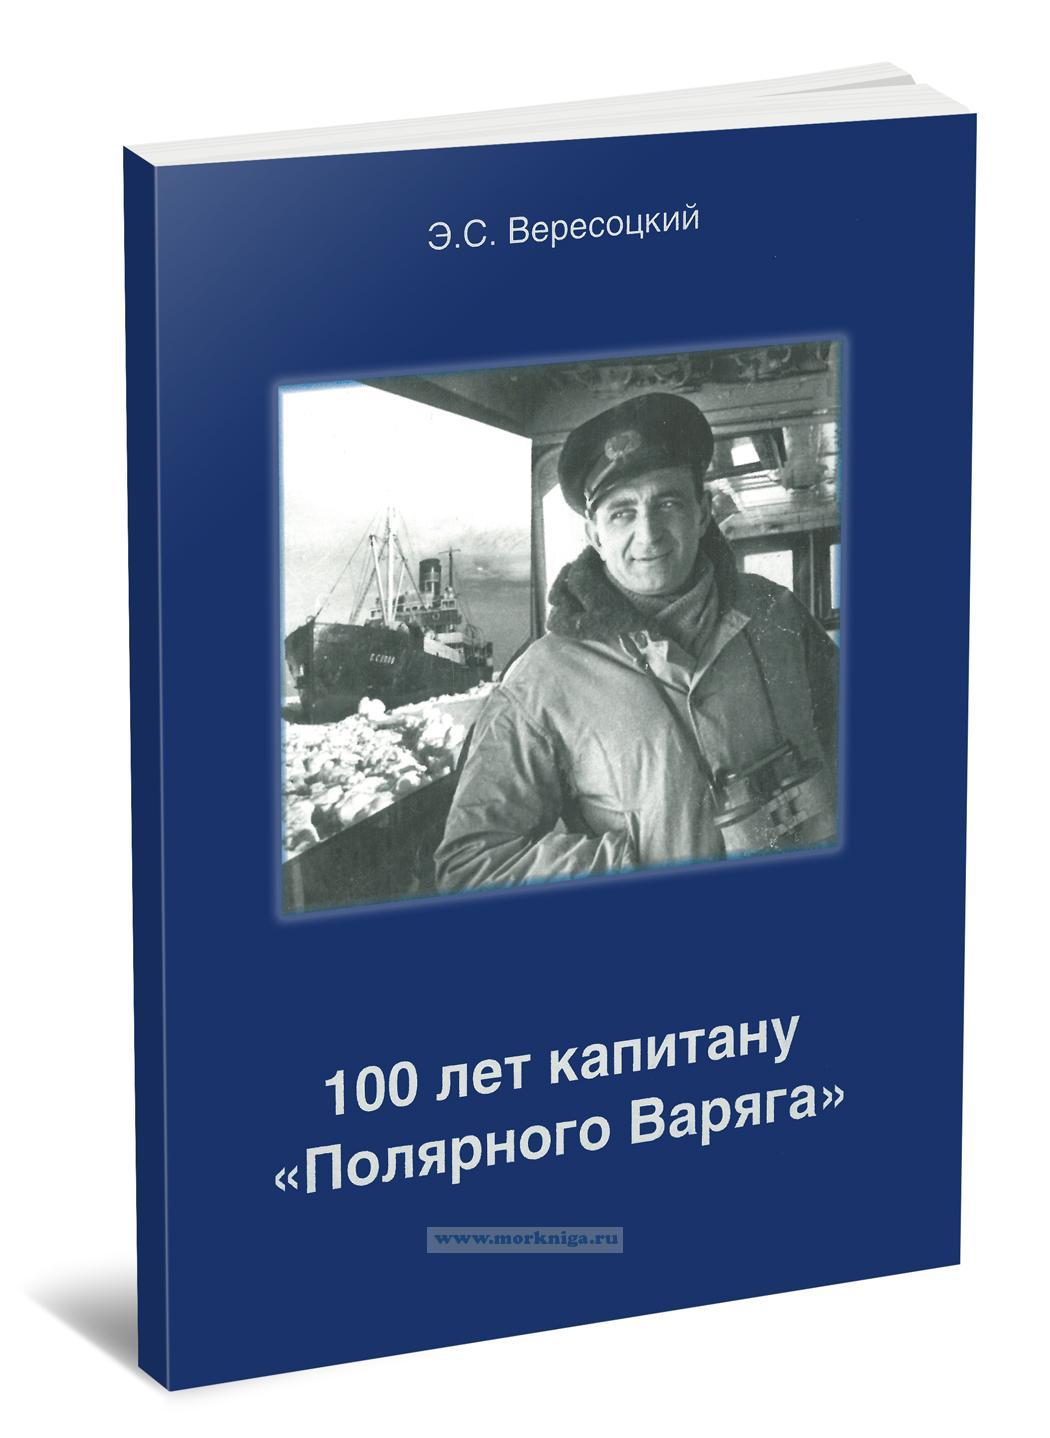 100 лет капитану